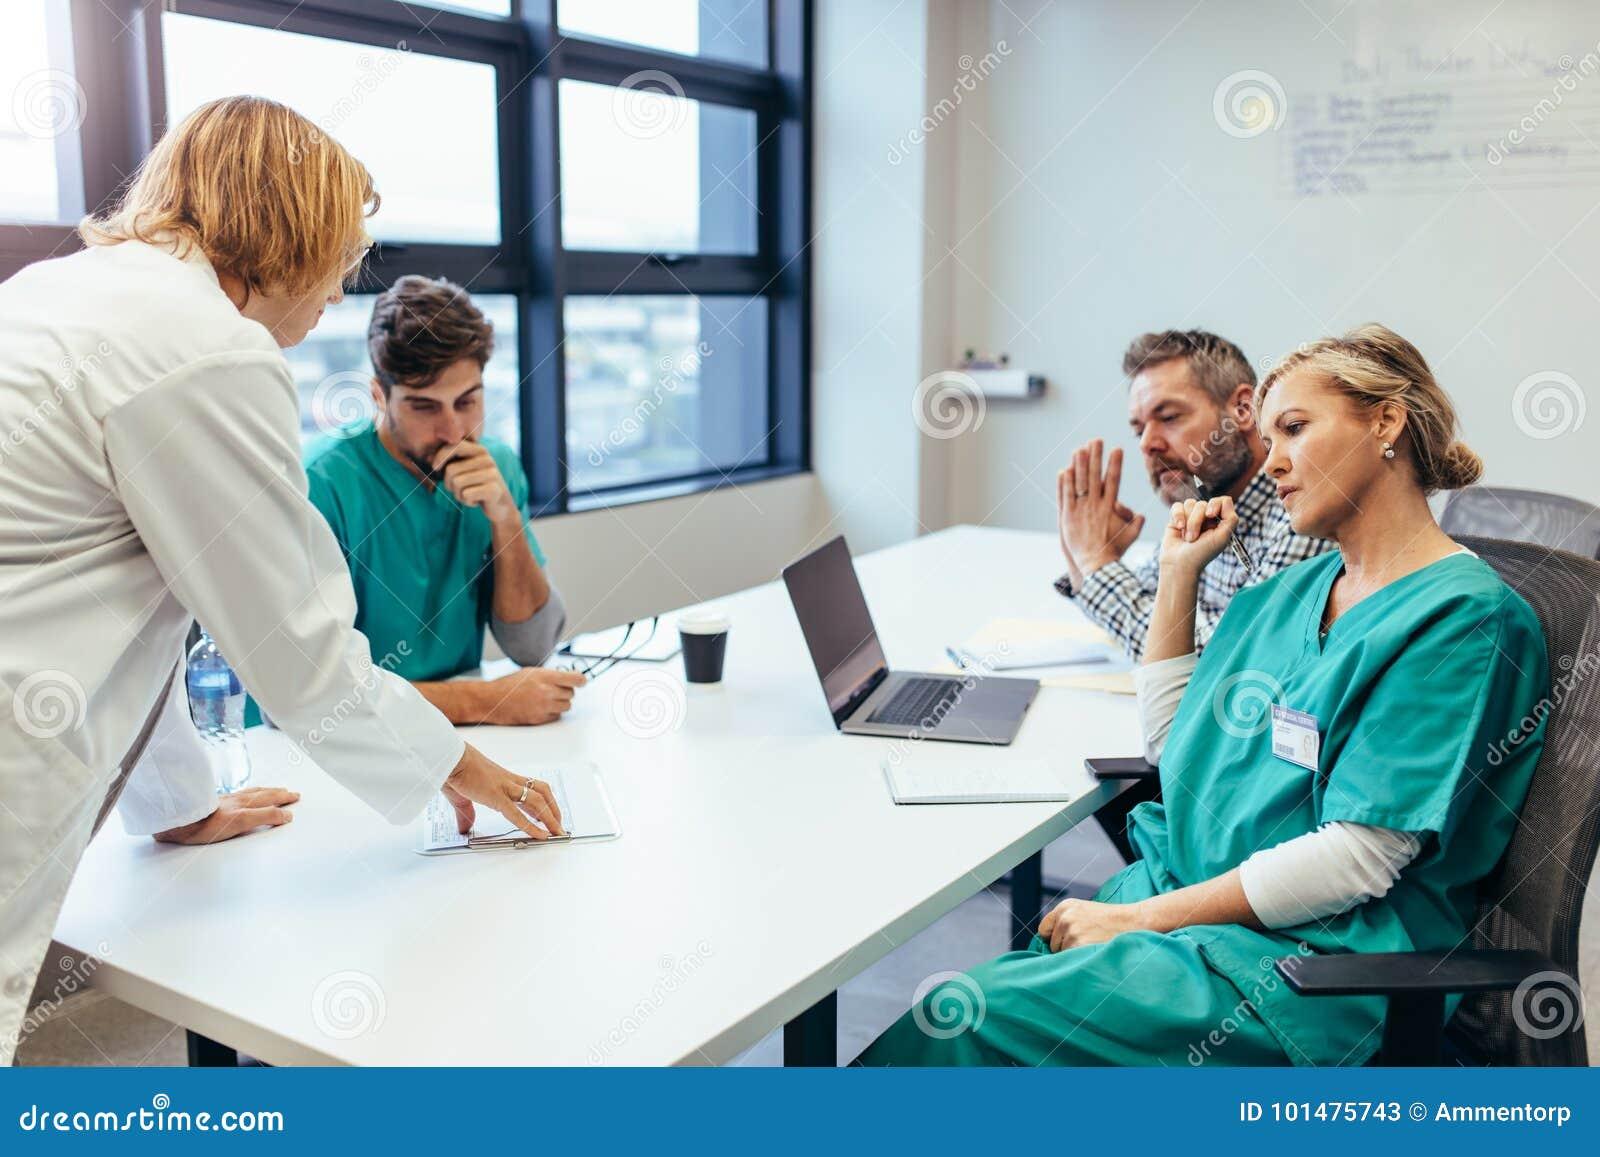 Groep medische beroepsbrainstorming in vergadering